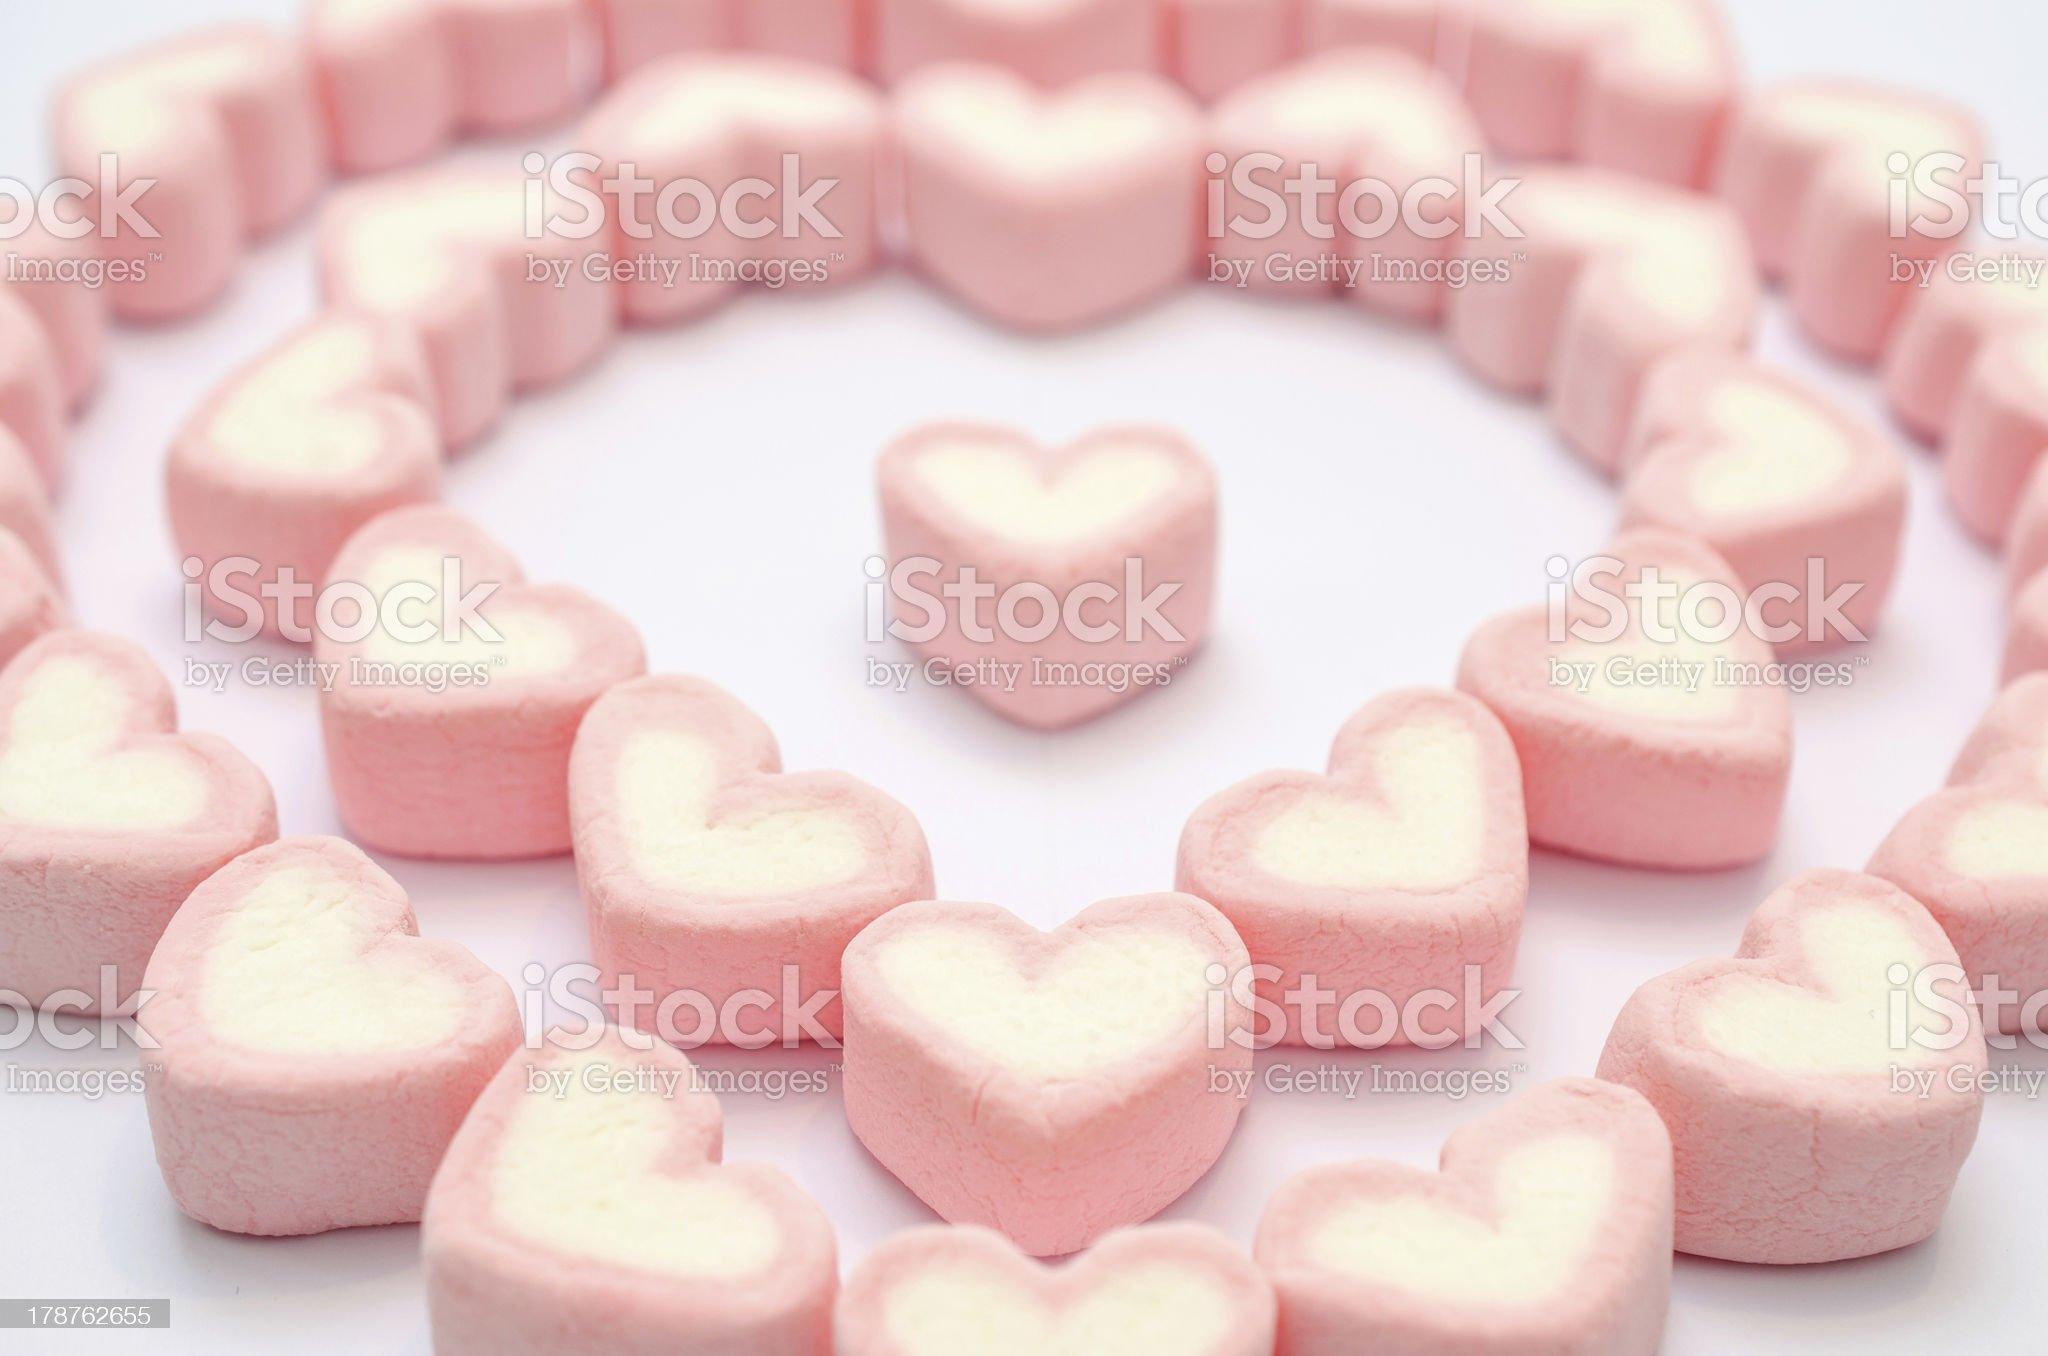 Pink heart marshmallow royalty-free stock photo